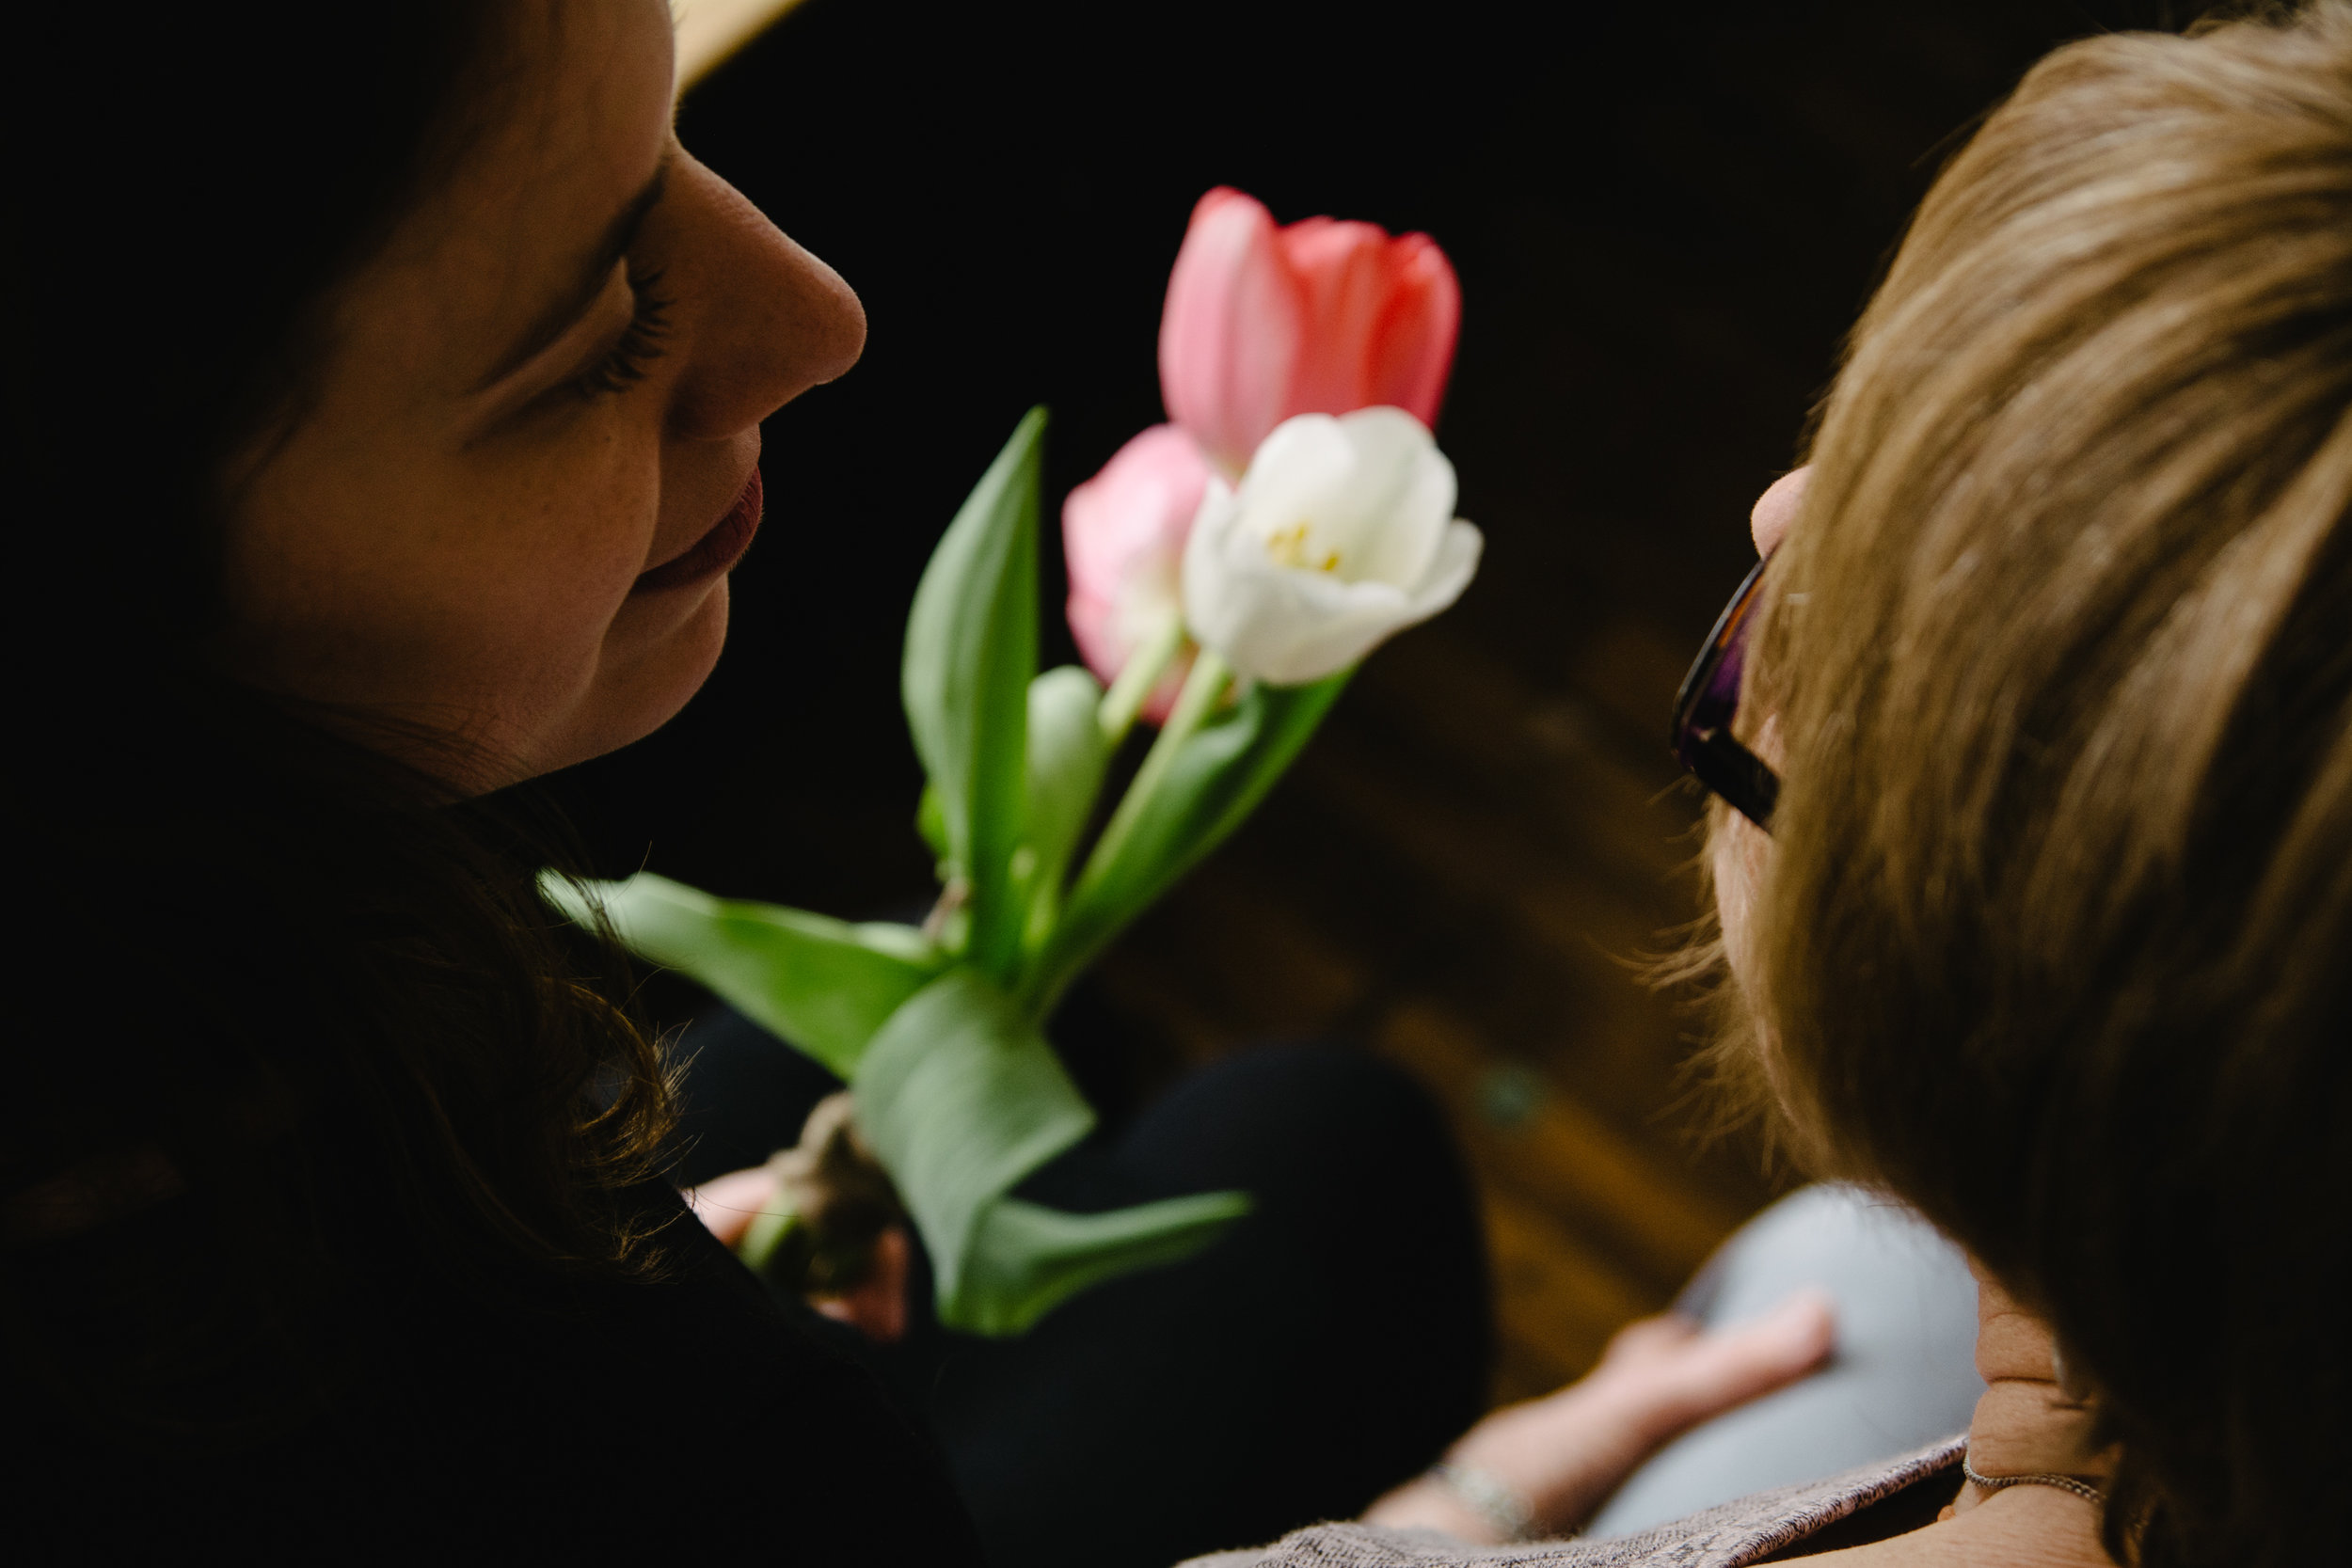 20180330_Mini_Vero_Maman-e-fleurs-69_corr_MOY.jpg